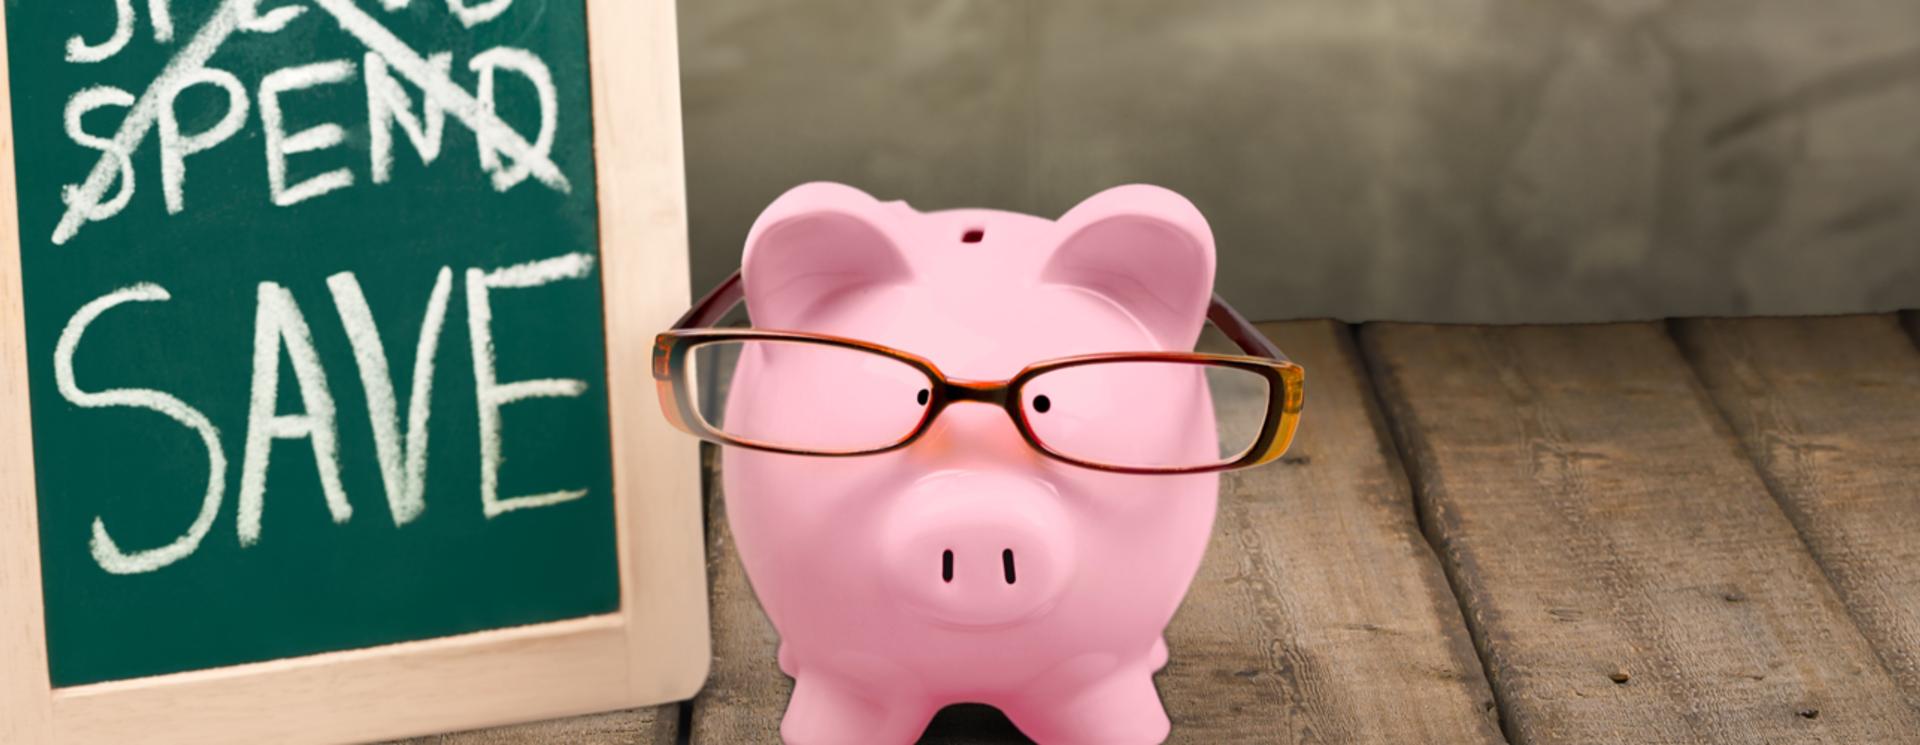 Survey: Saving a Top Priority for Millennials, but Impulse Spending a Major Barrier